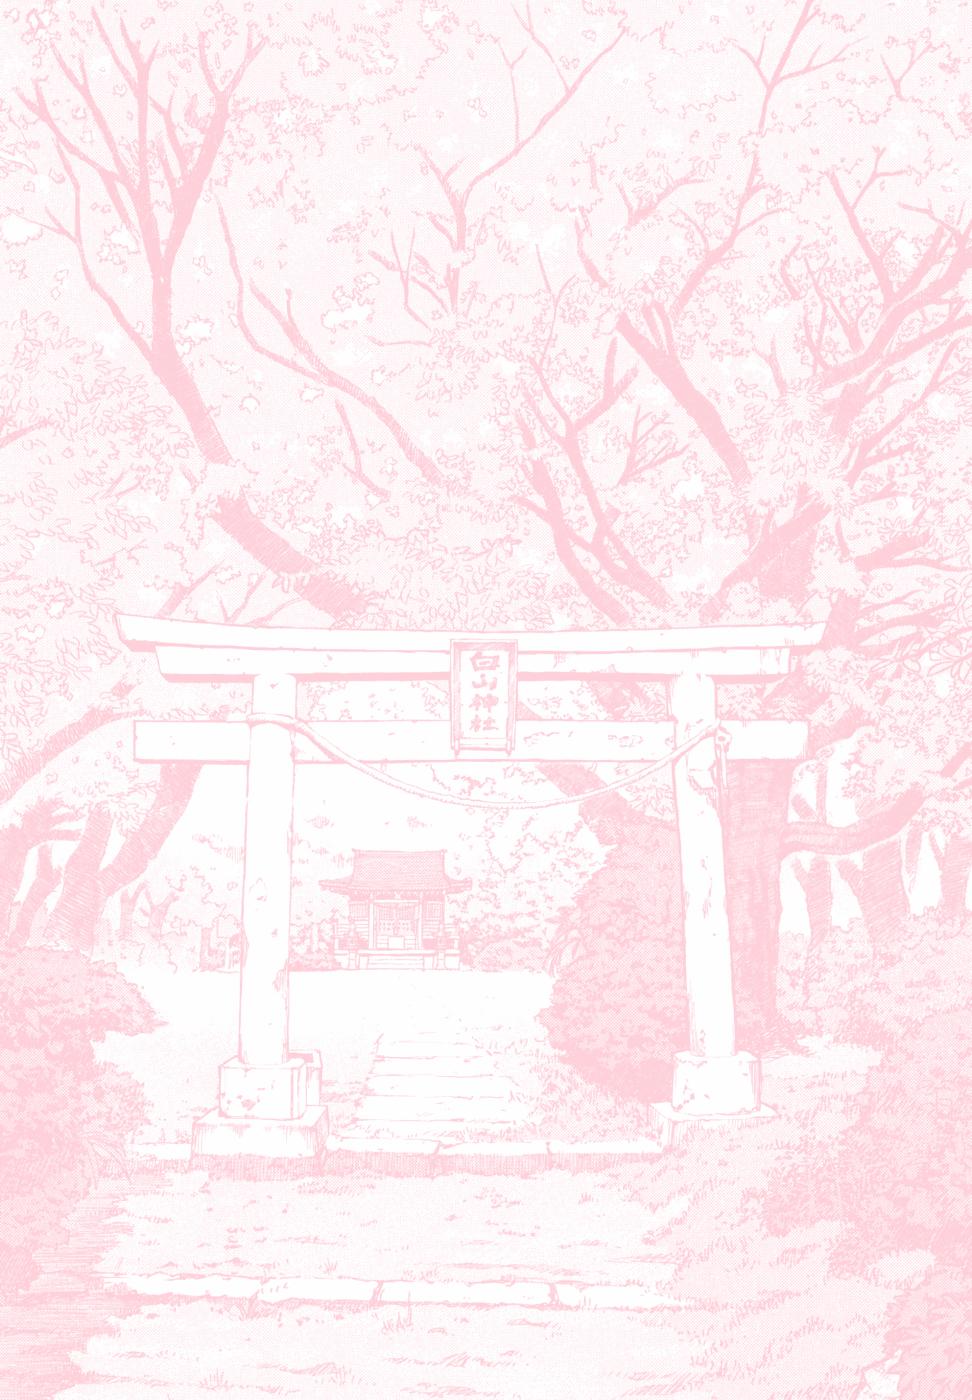 Pink Pastel Aesthetic Wallpaper